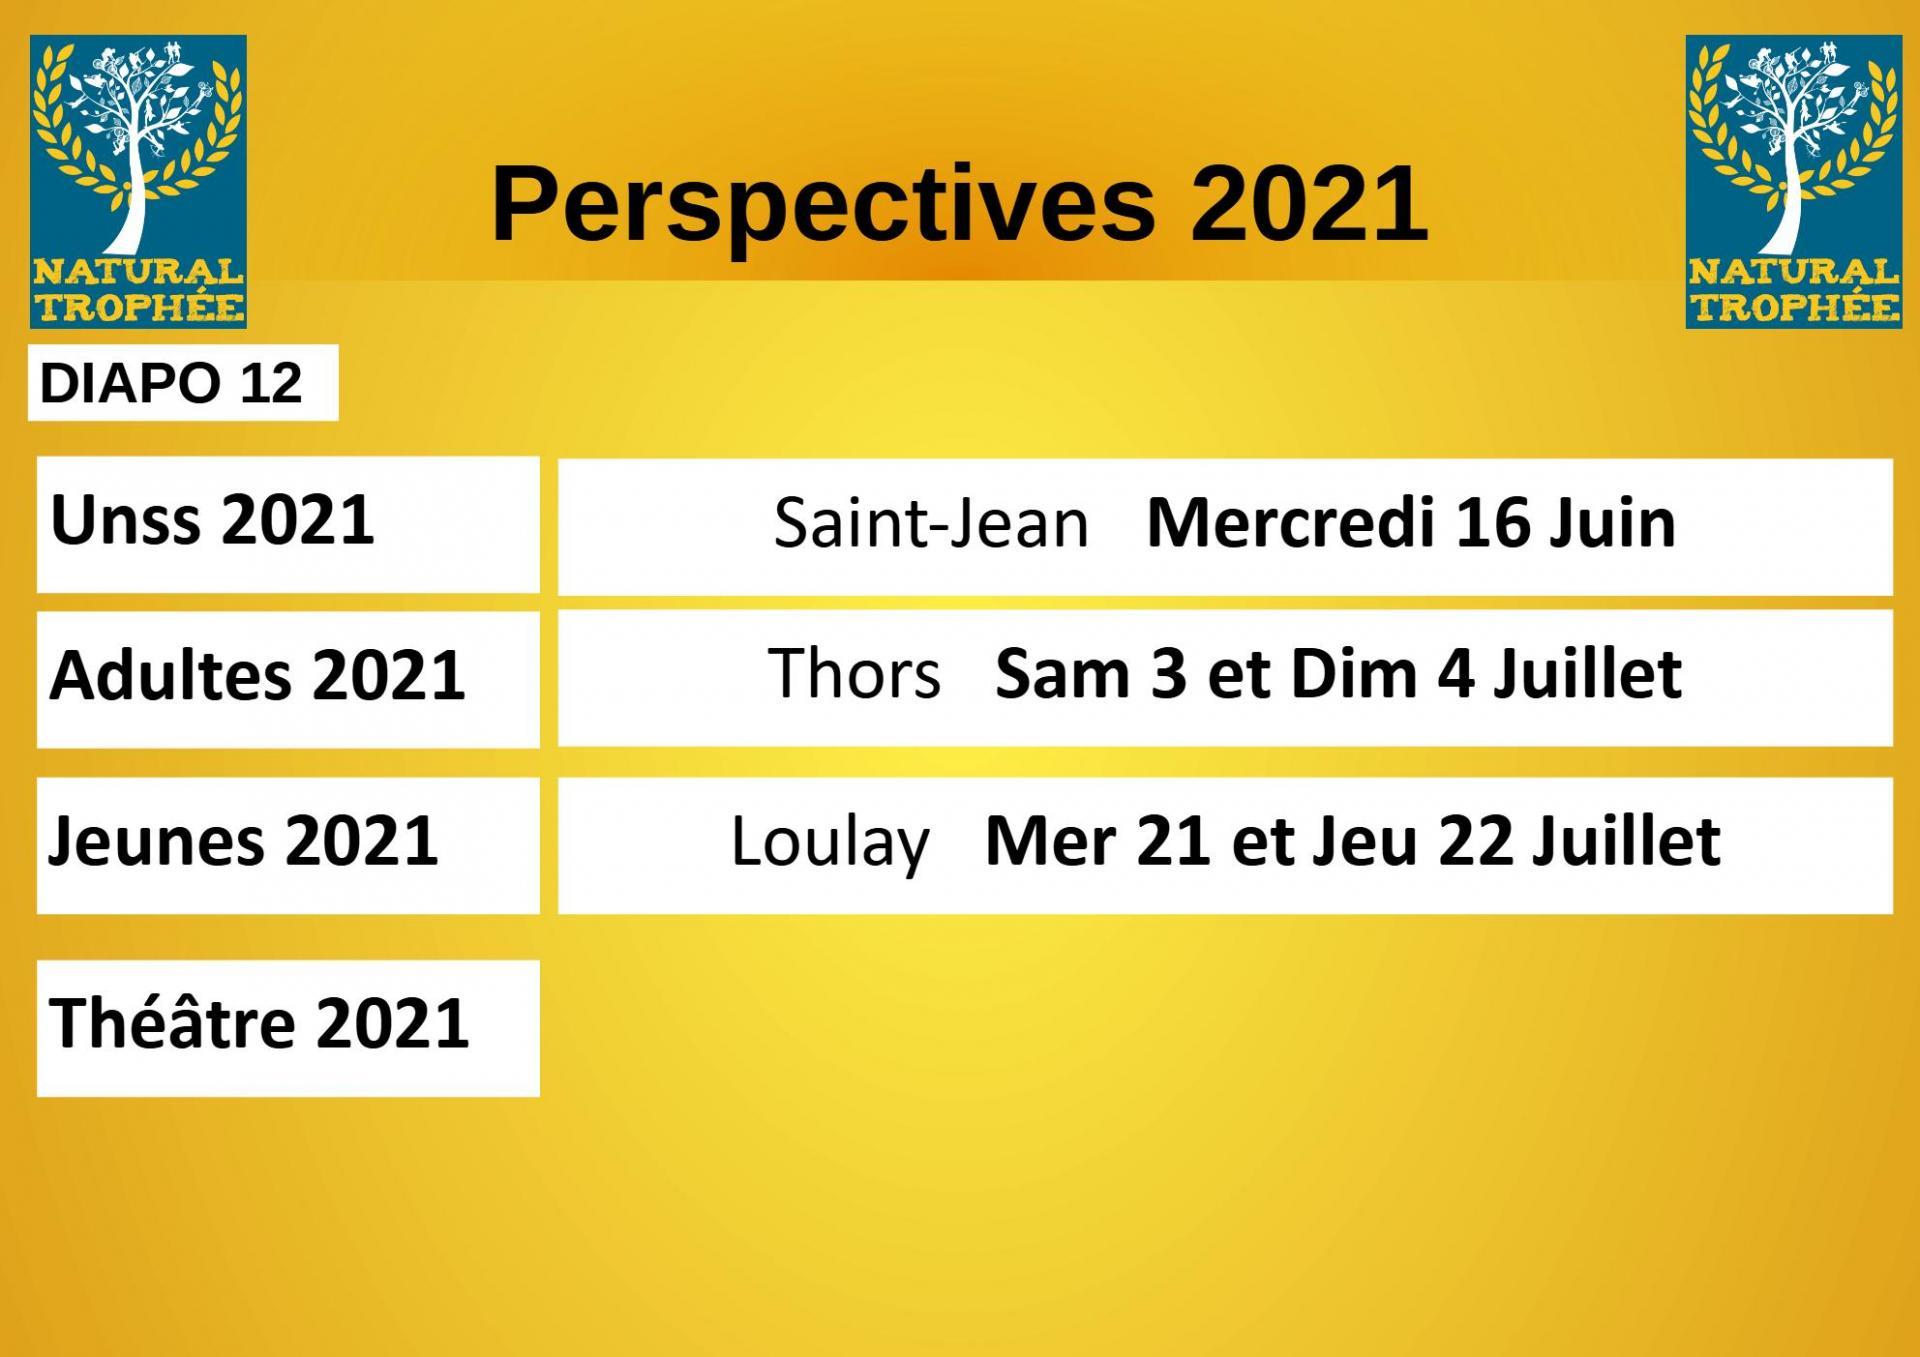 Diapo 12 Perspectives 2021